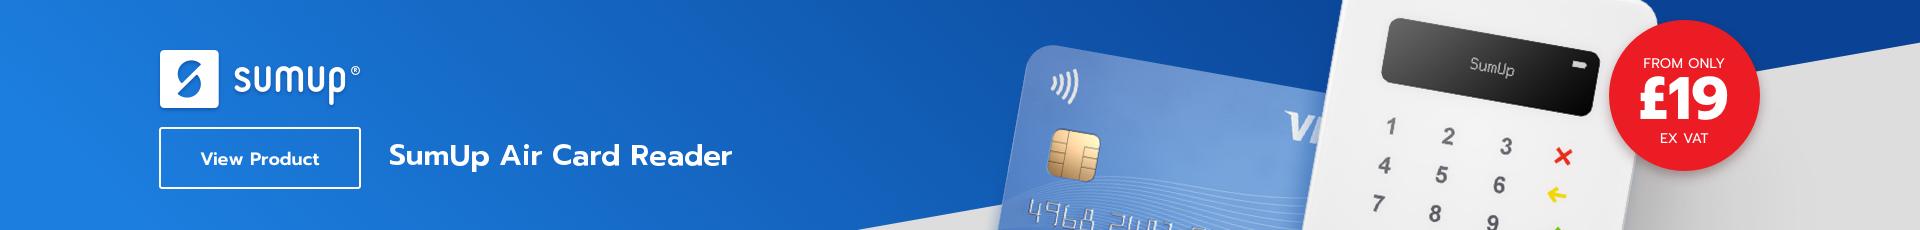 SumUp Air Smart Card Reader